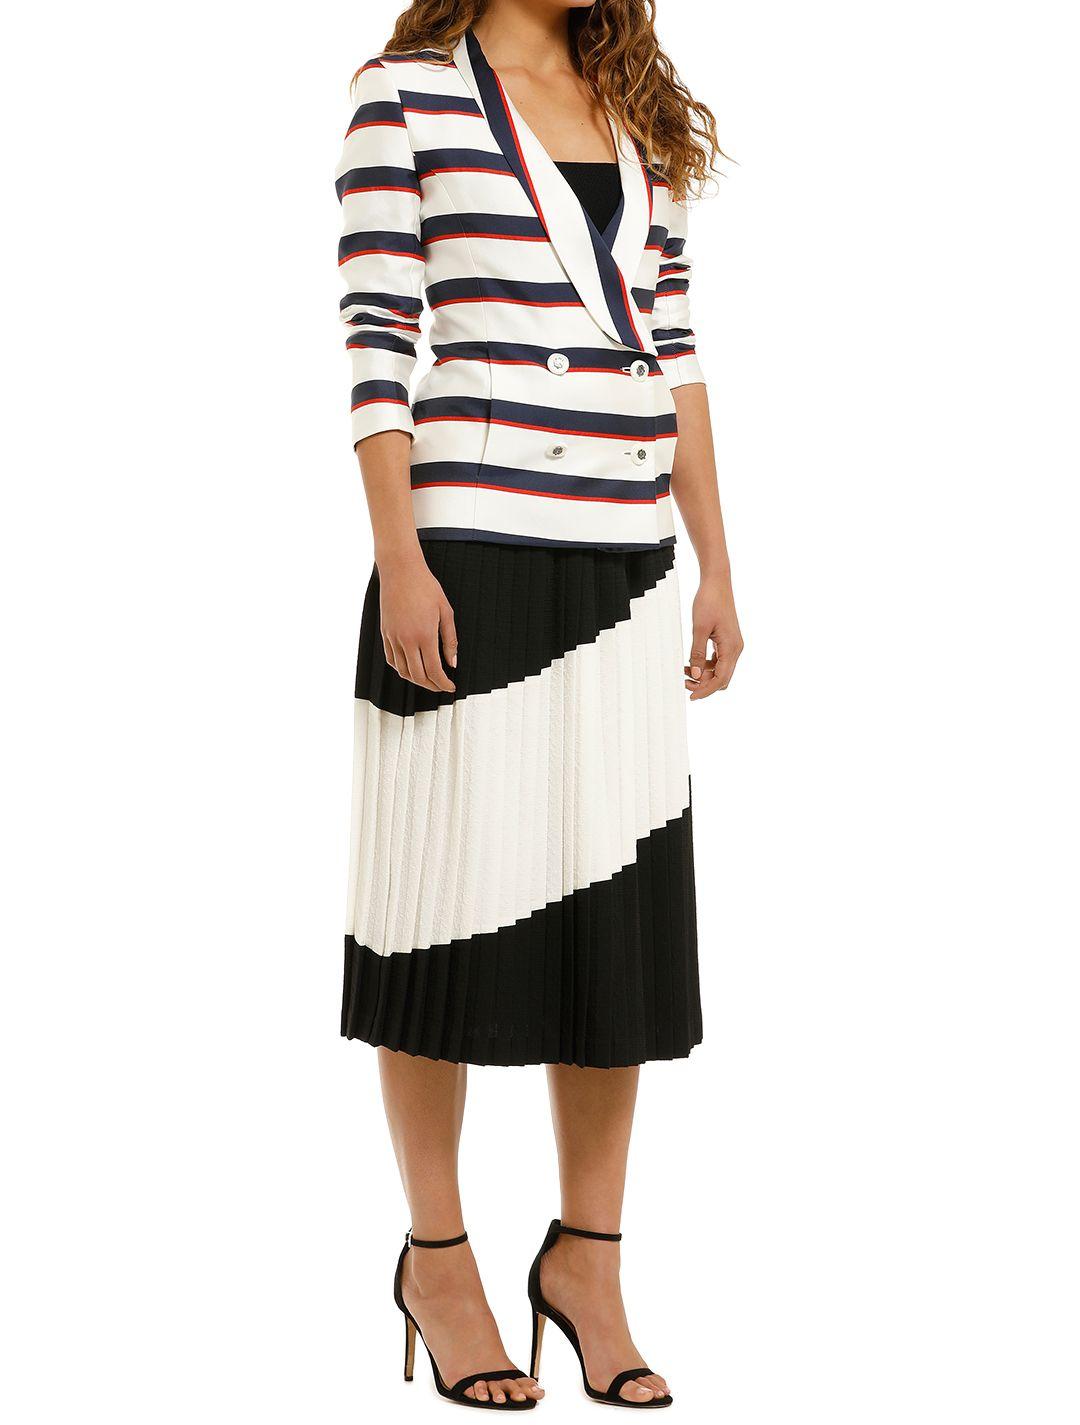 Cooper-By-Trelise-Cooper-Buoy-O-Buoy-Jacket-Red-Blue-Stripe-Side